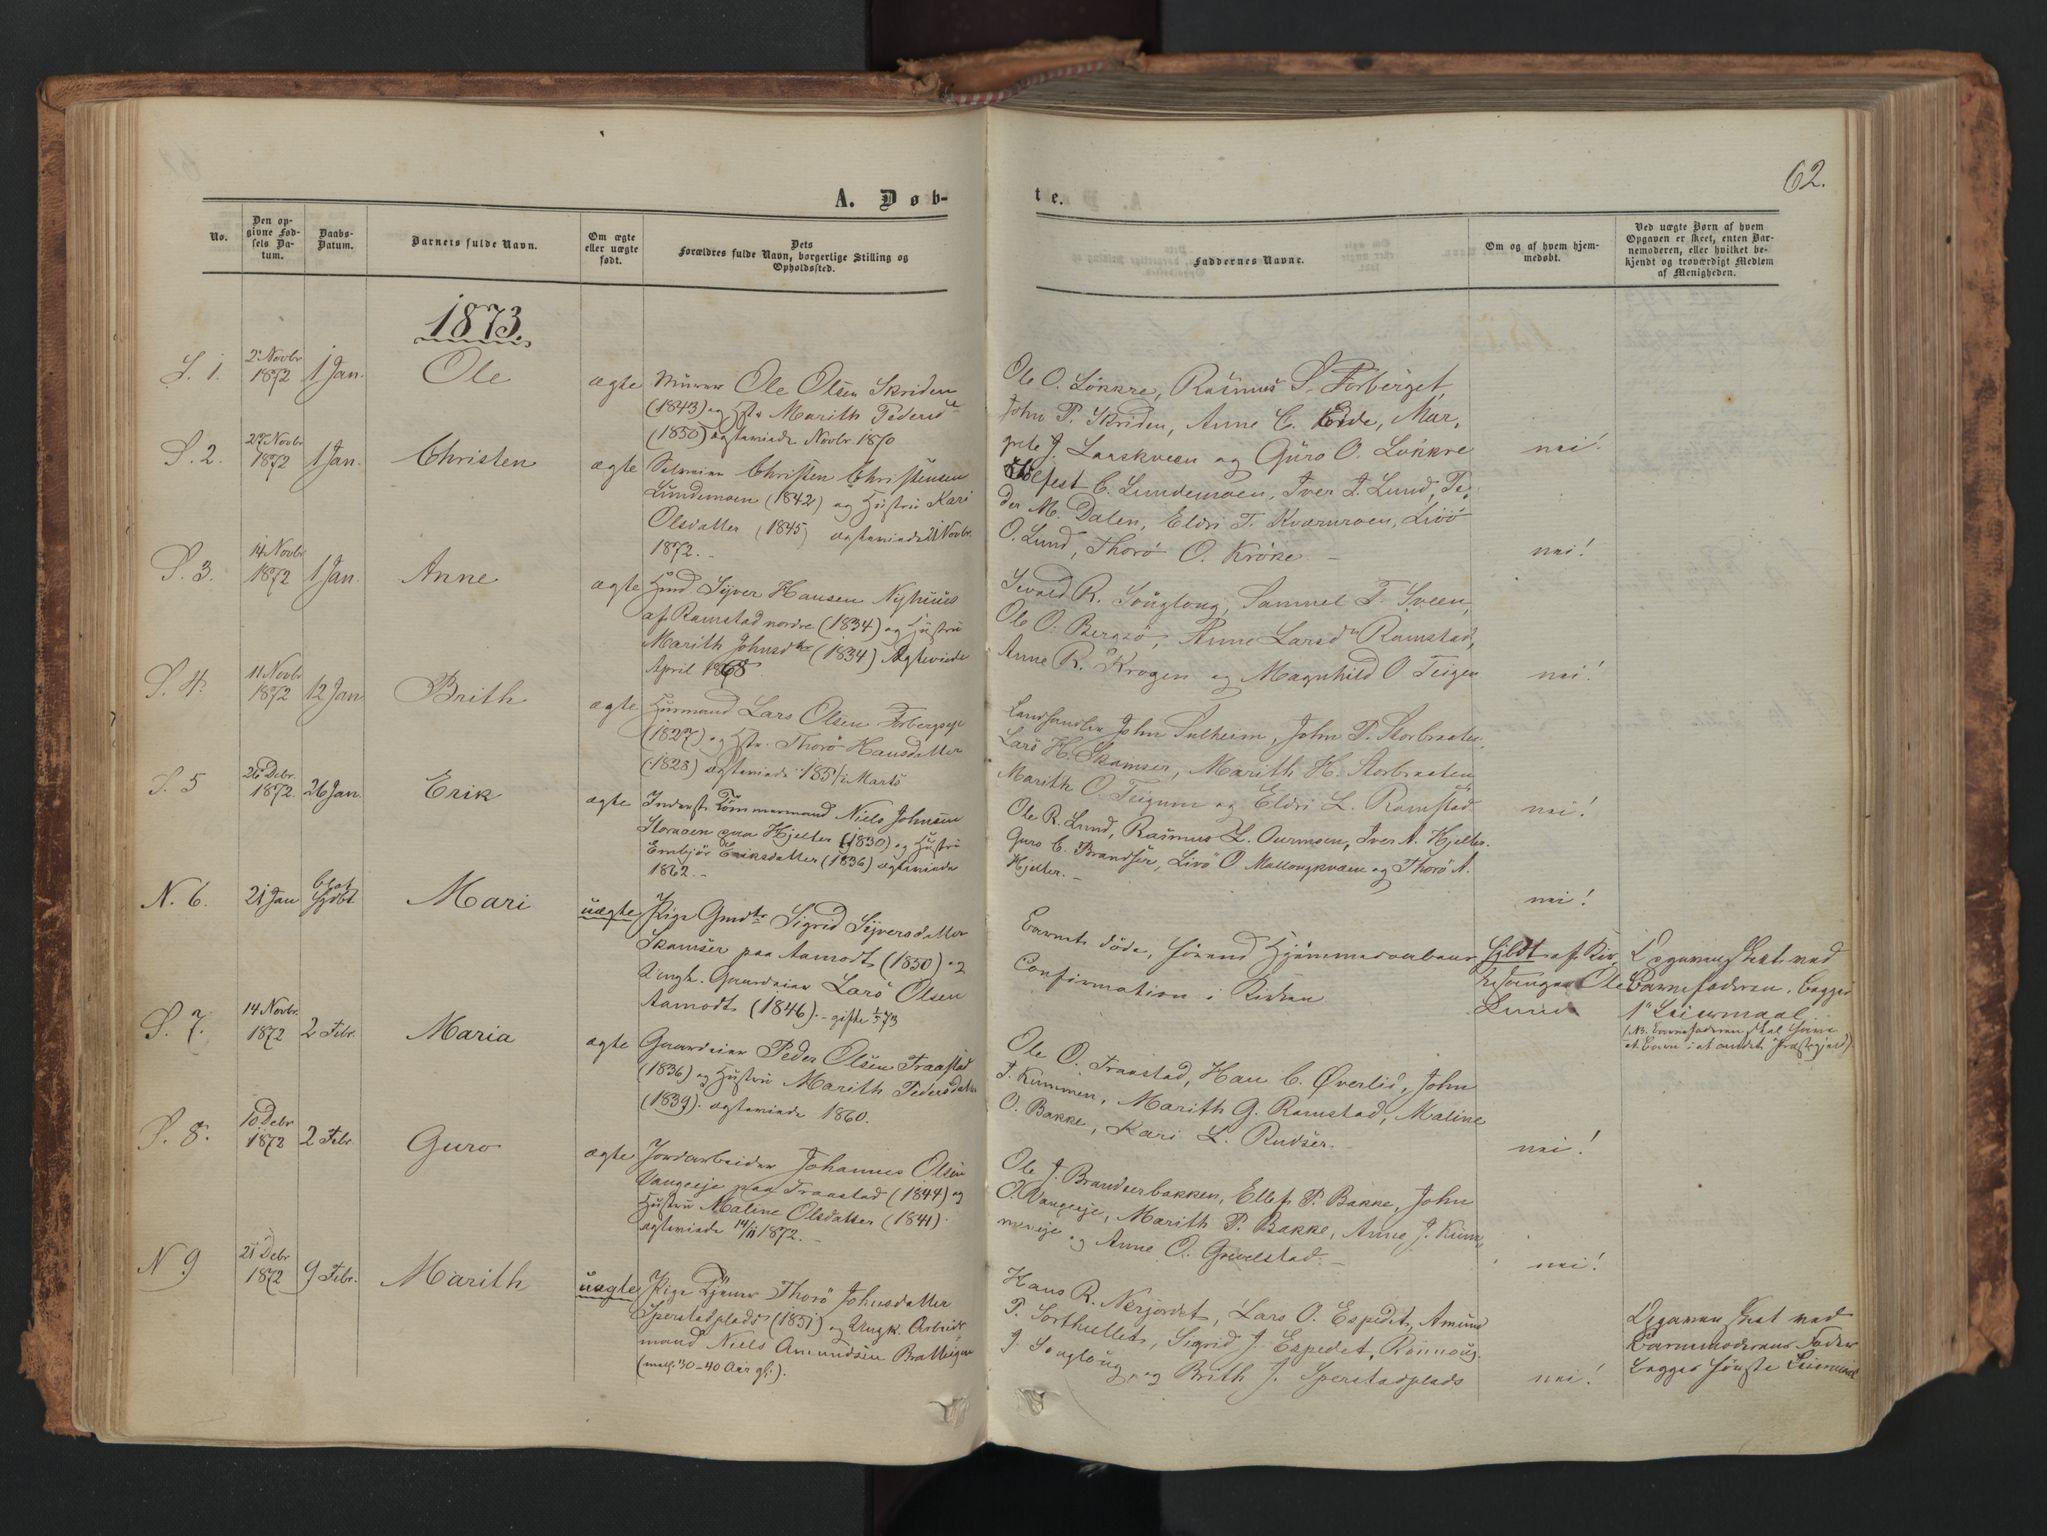 SAH, Skjåk prestekontor, Ministerialbok nr. 1, 1863-1879, s. 62